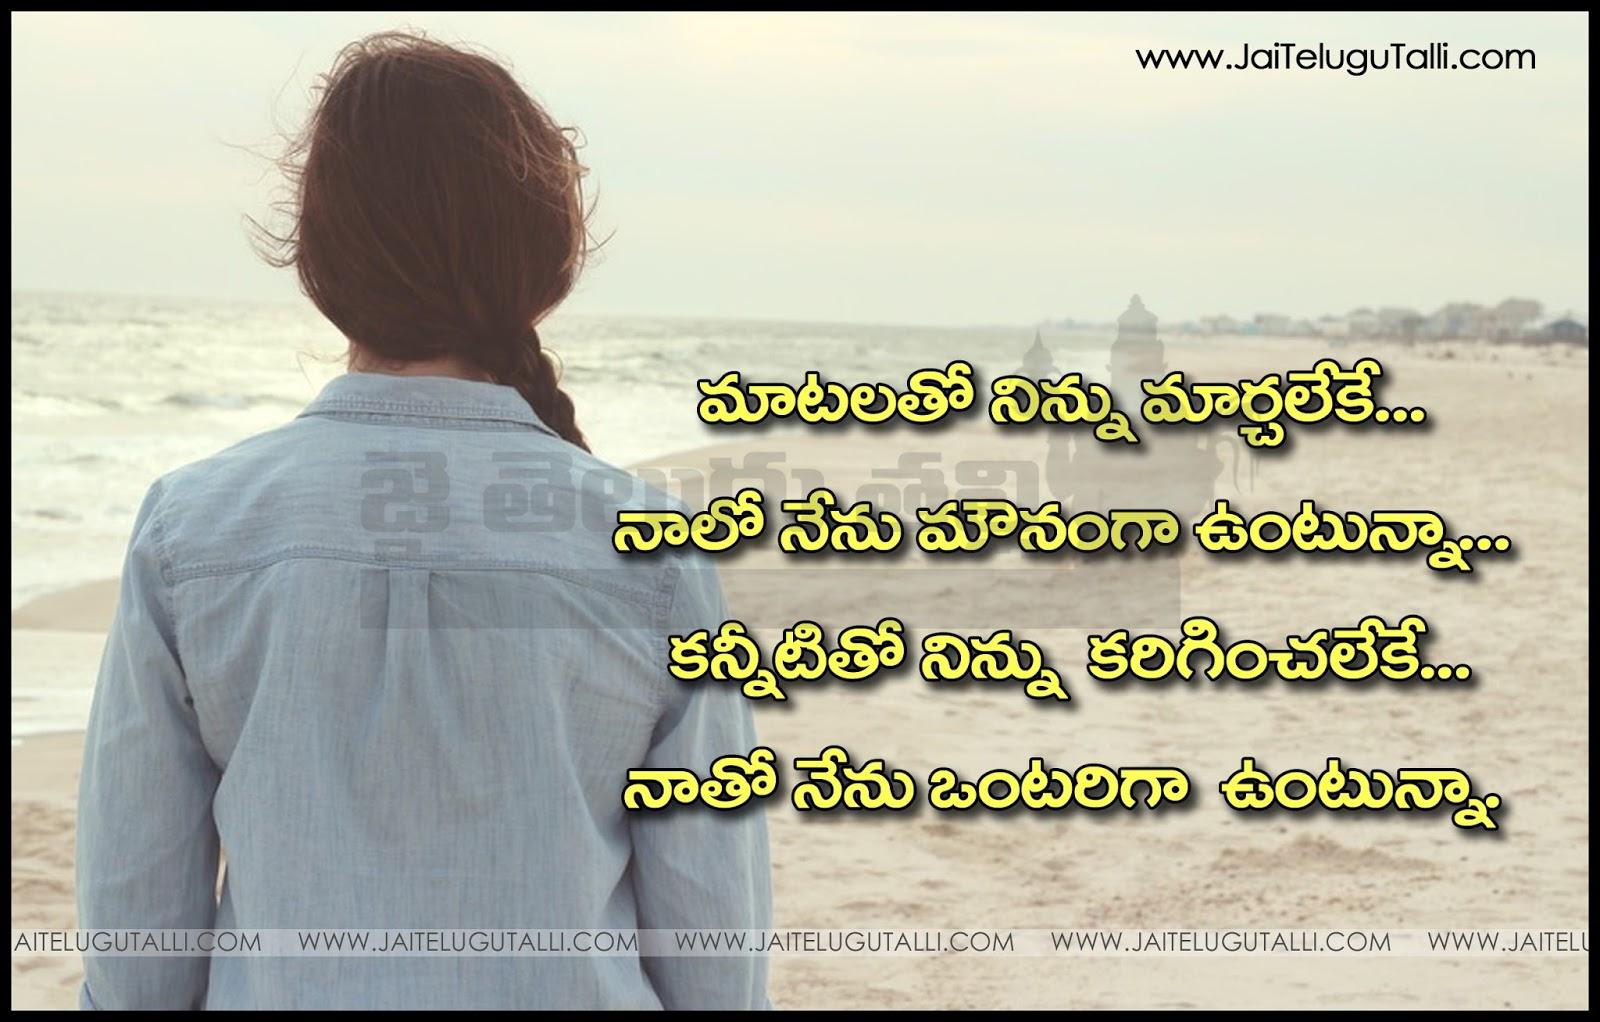 Best Telugu Love Quotes And Hd Wallpapers Wwwjaitelugutallicom